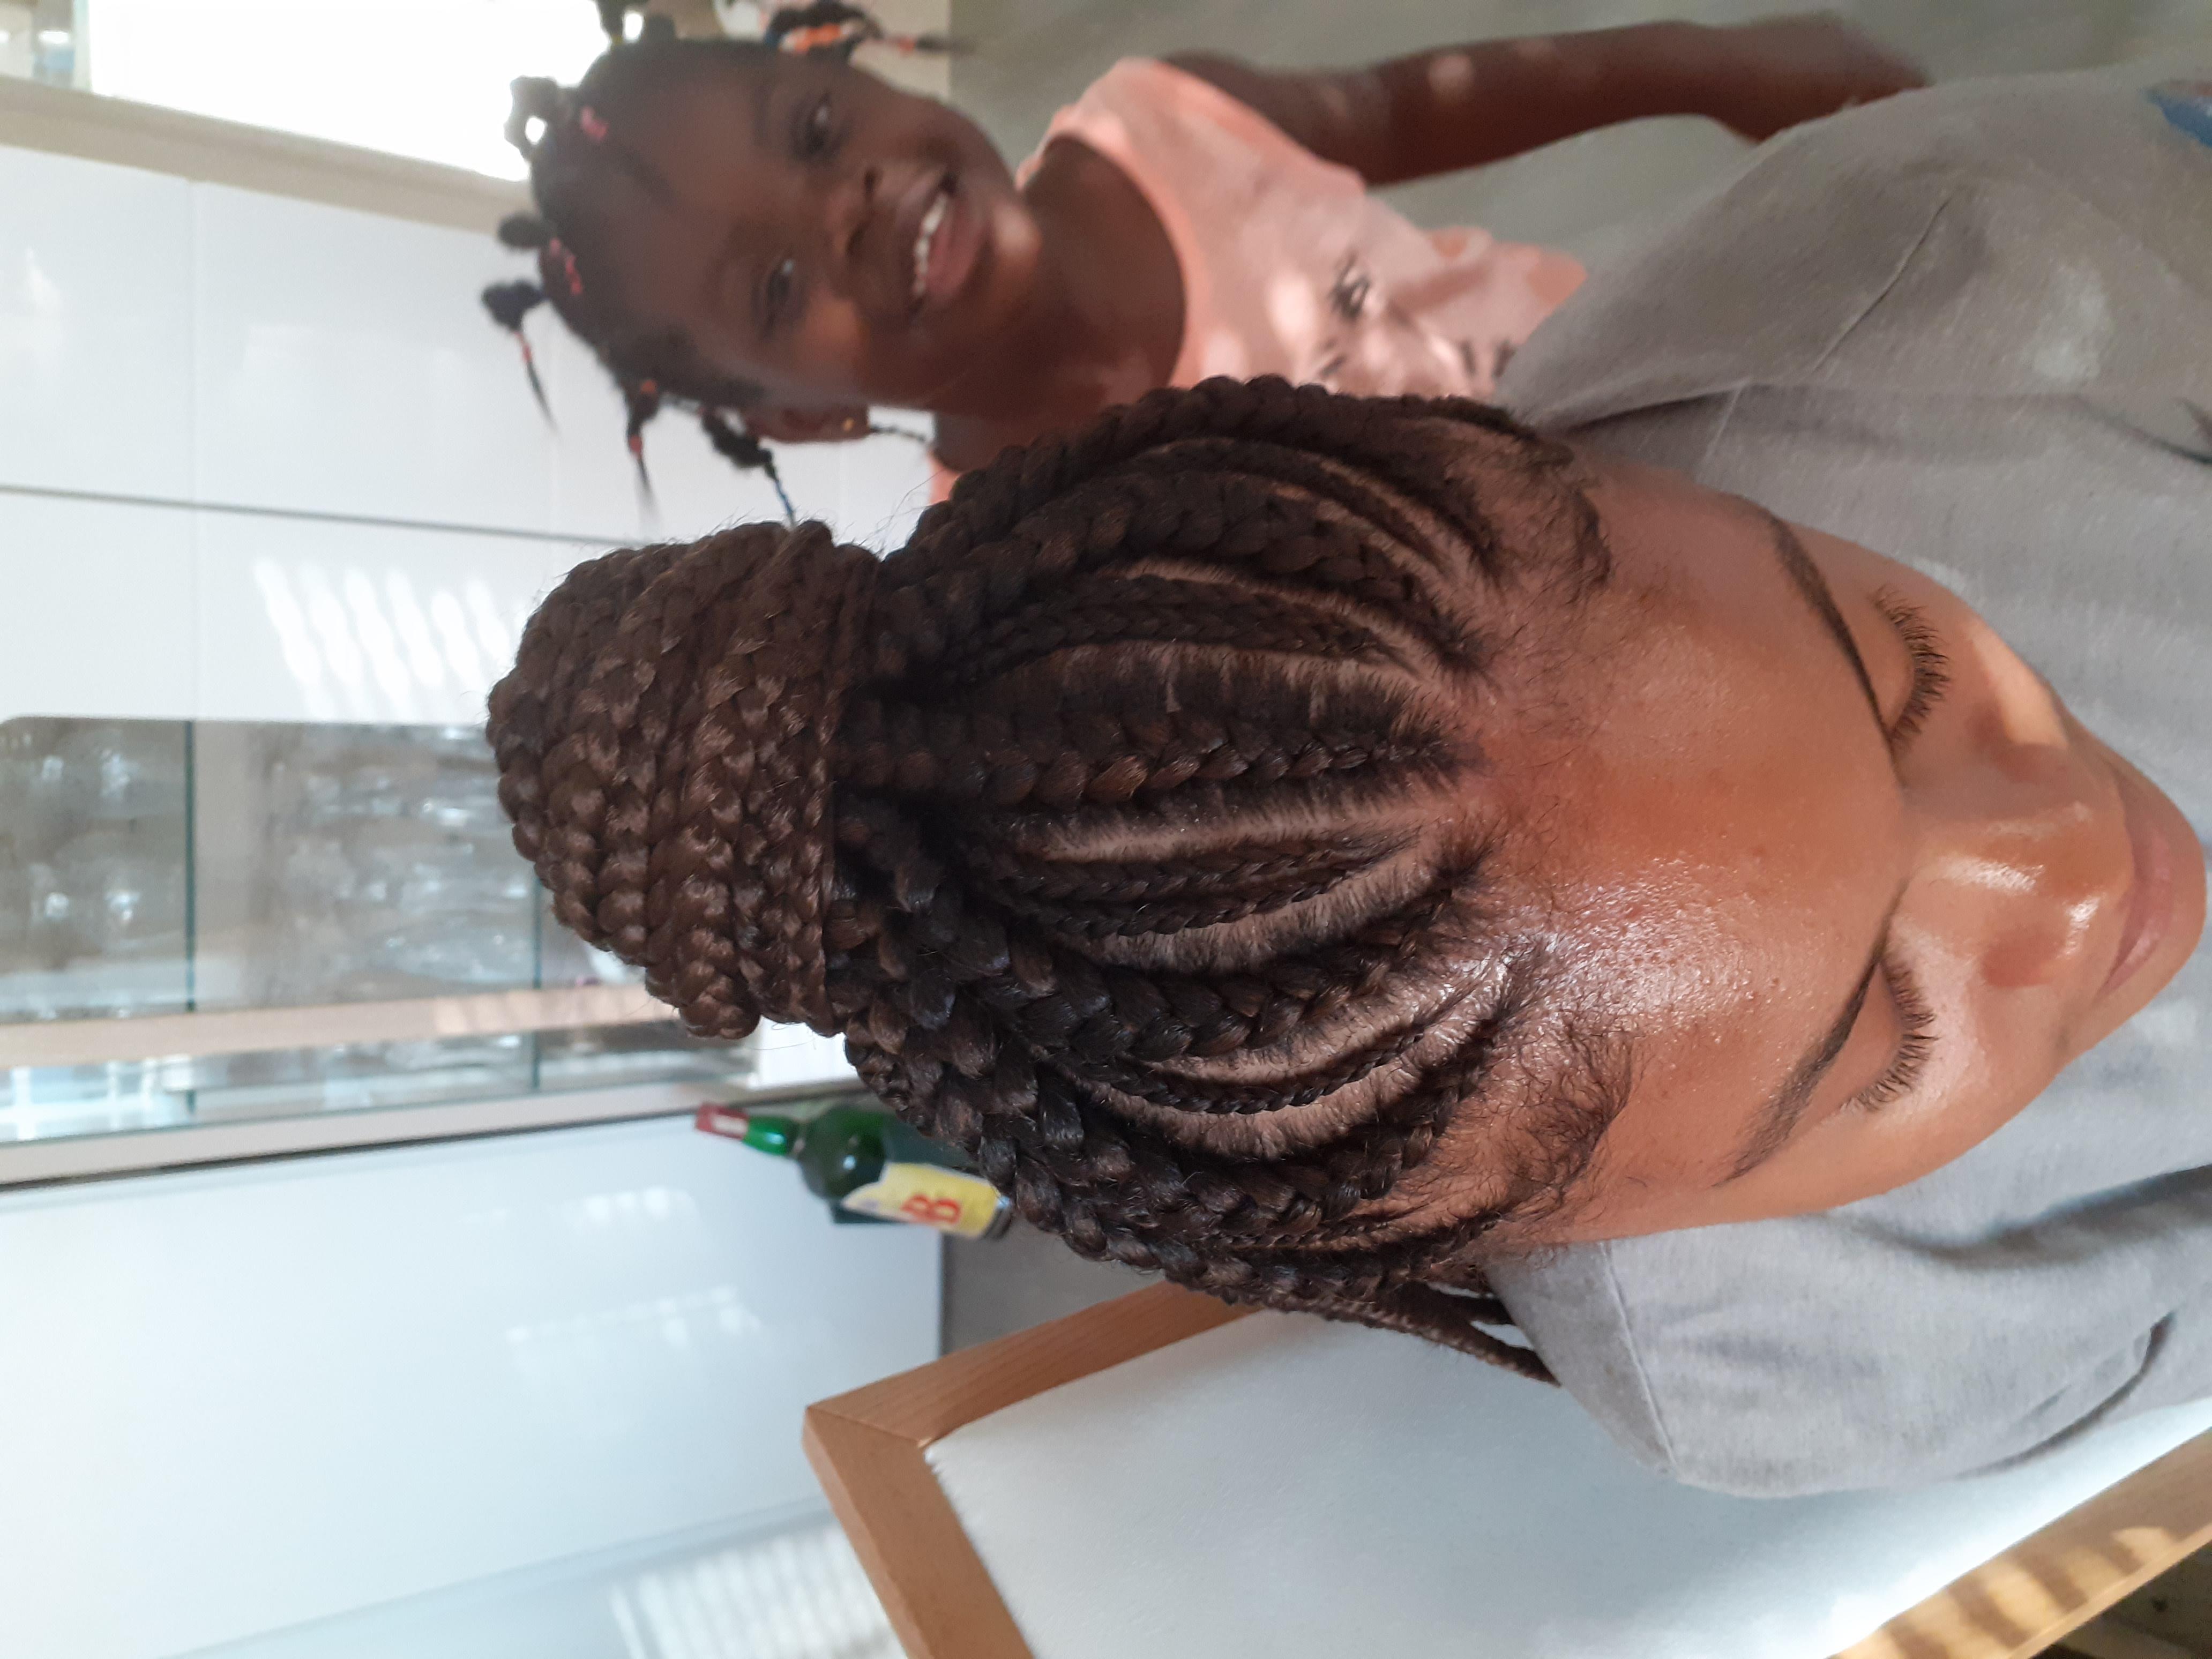 salon de coiffure afro tresse tresses box braids crochet braids vanilles tissages paris 75 77 78 91 92 93 94 95 PJAIFUDJ